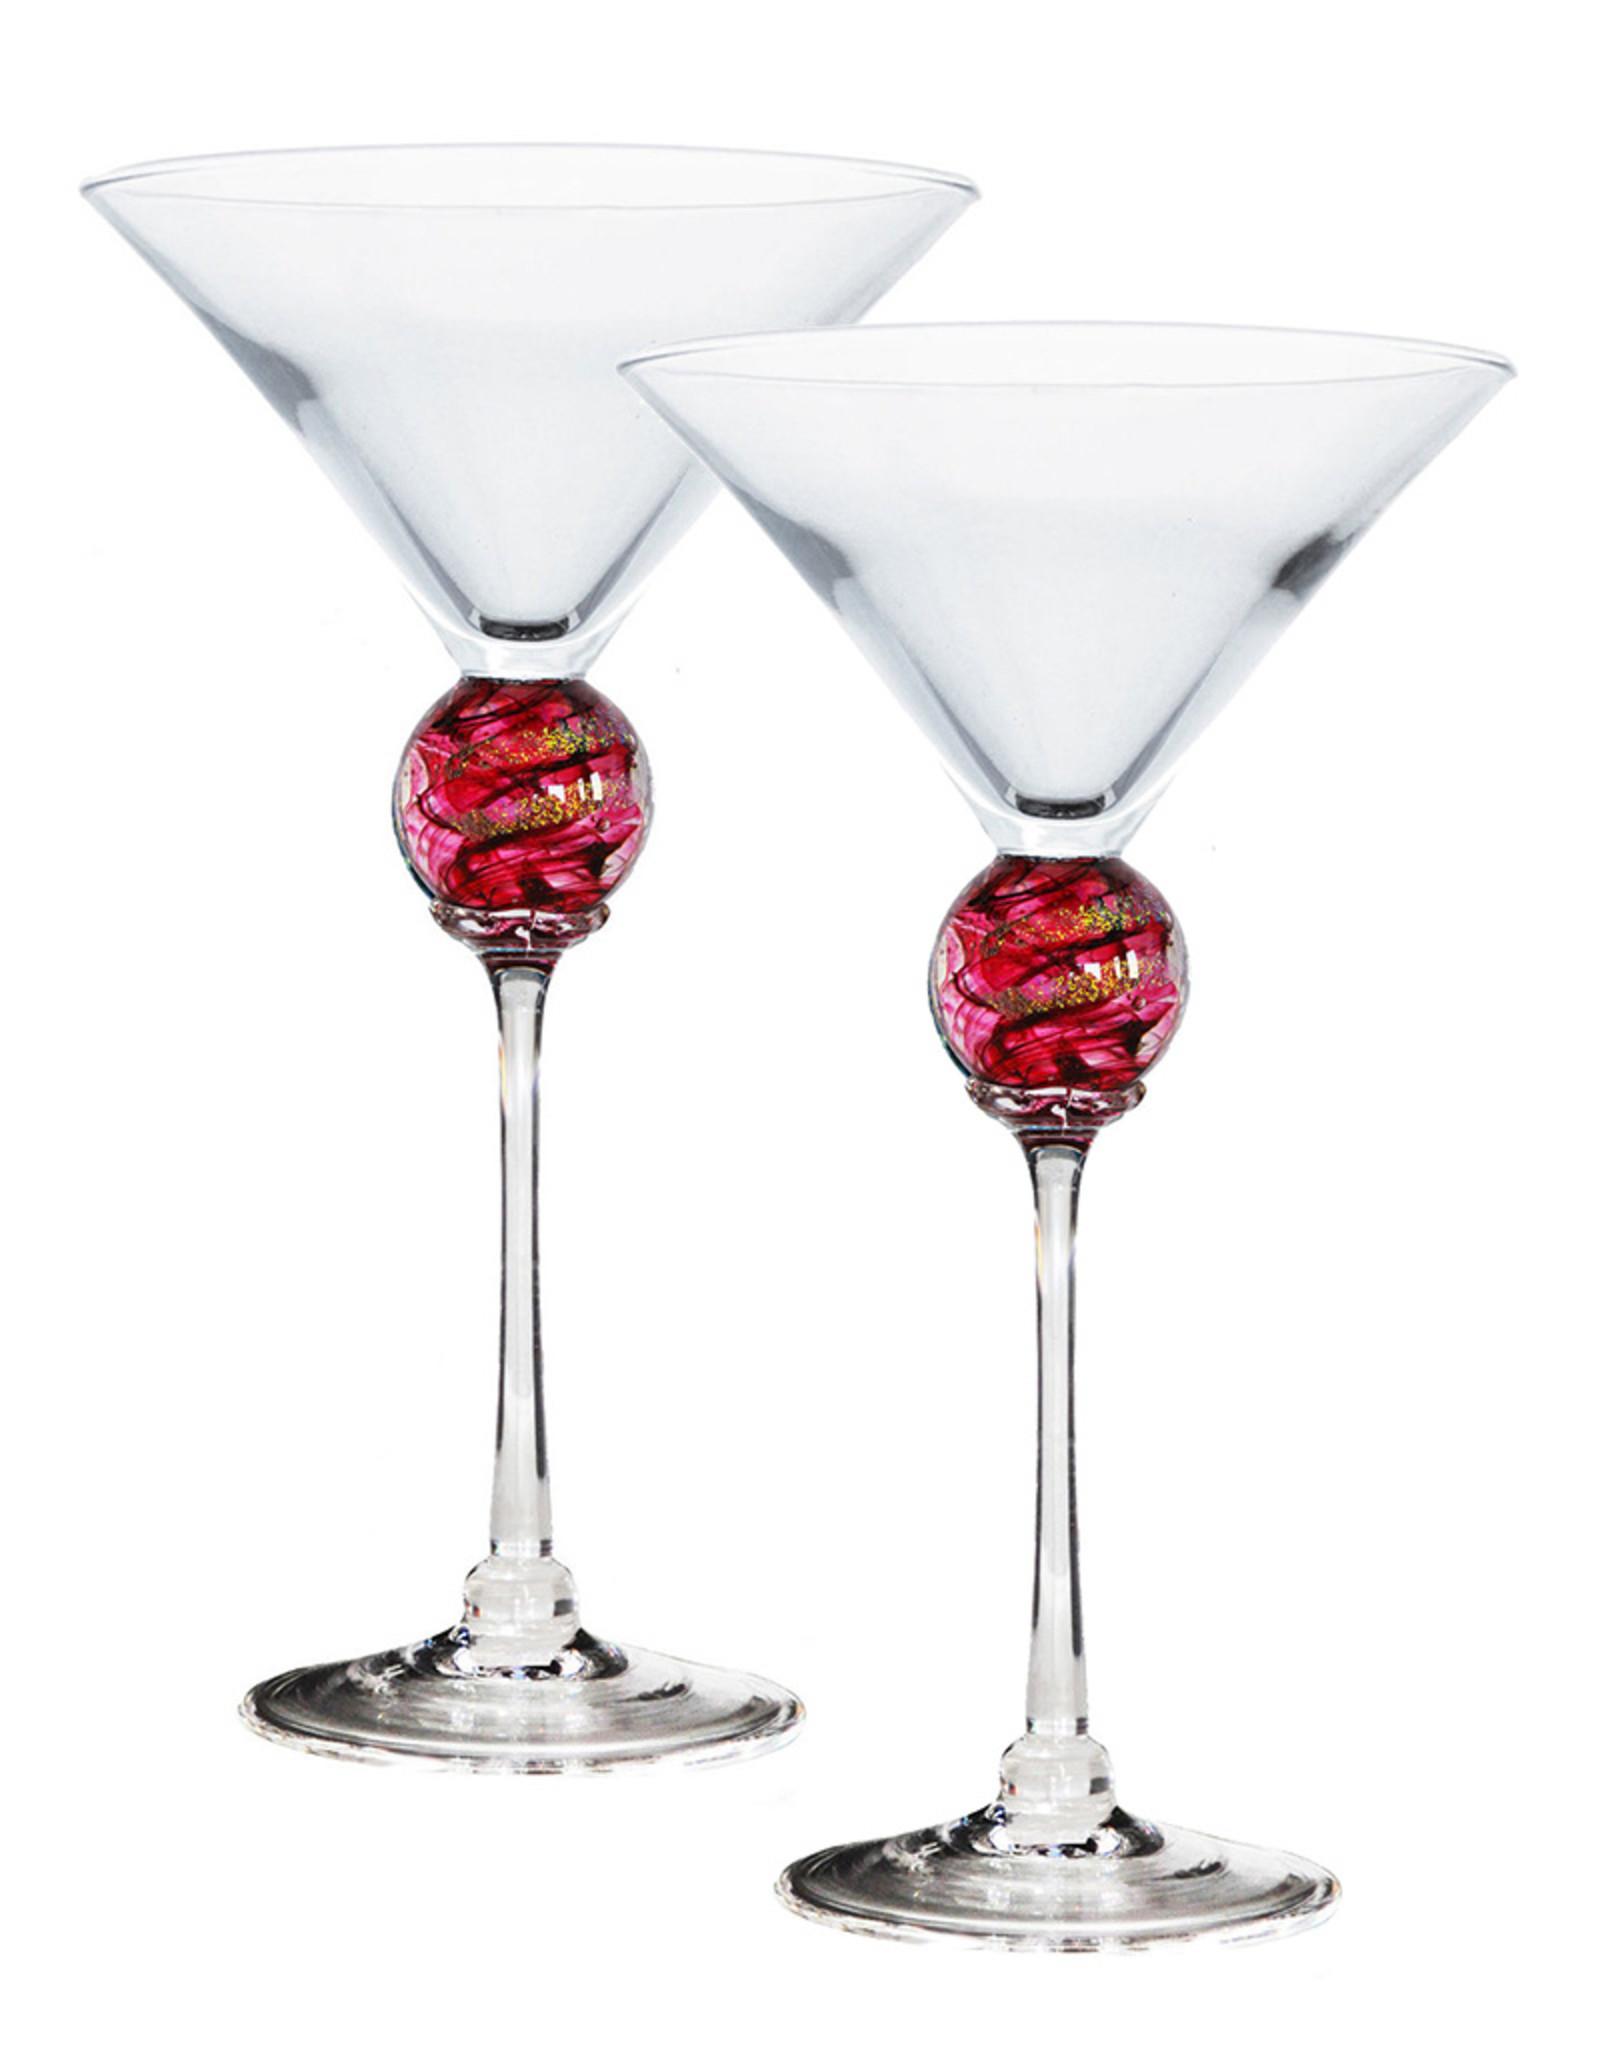 ROMEO GLASS RUBY PLANET MARTINI GLASS